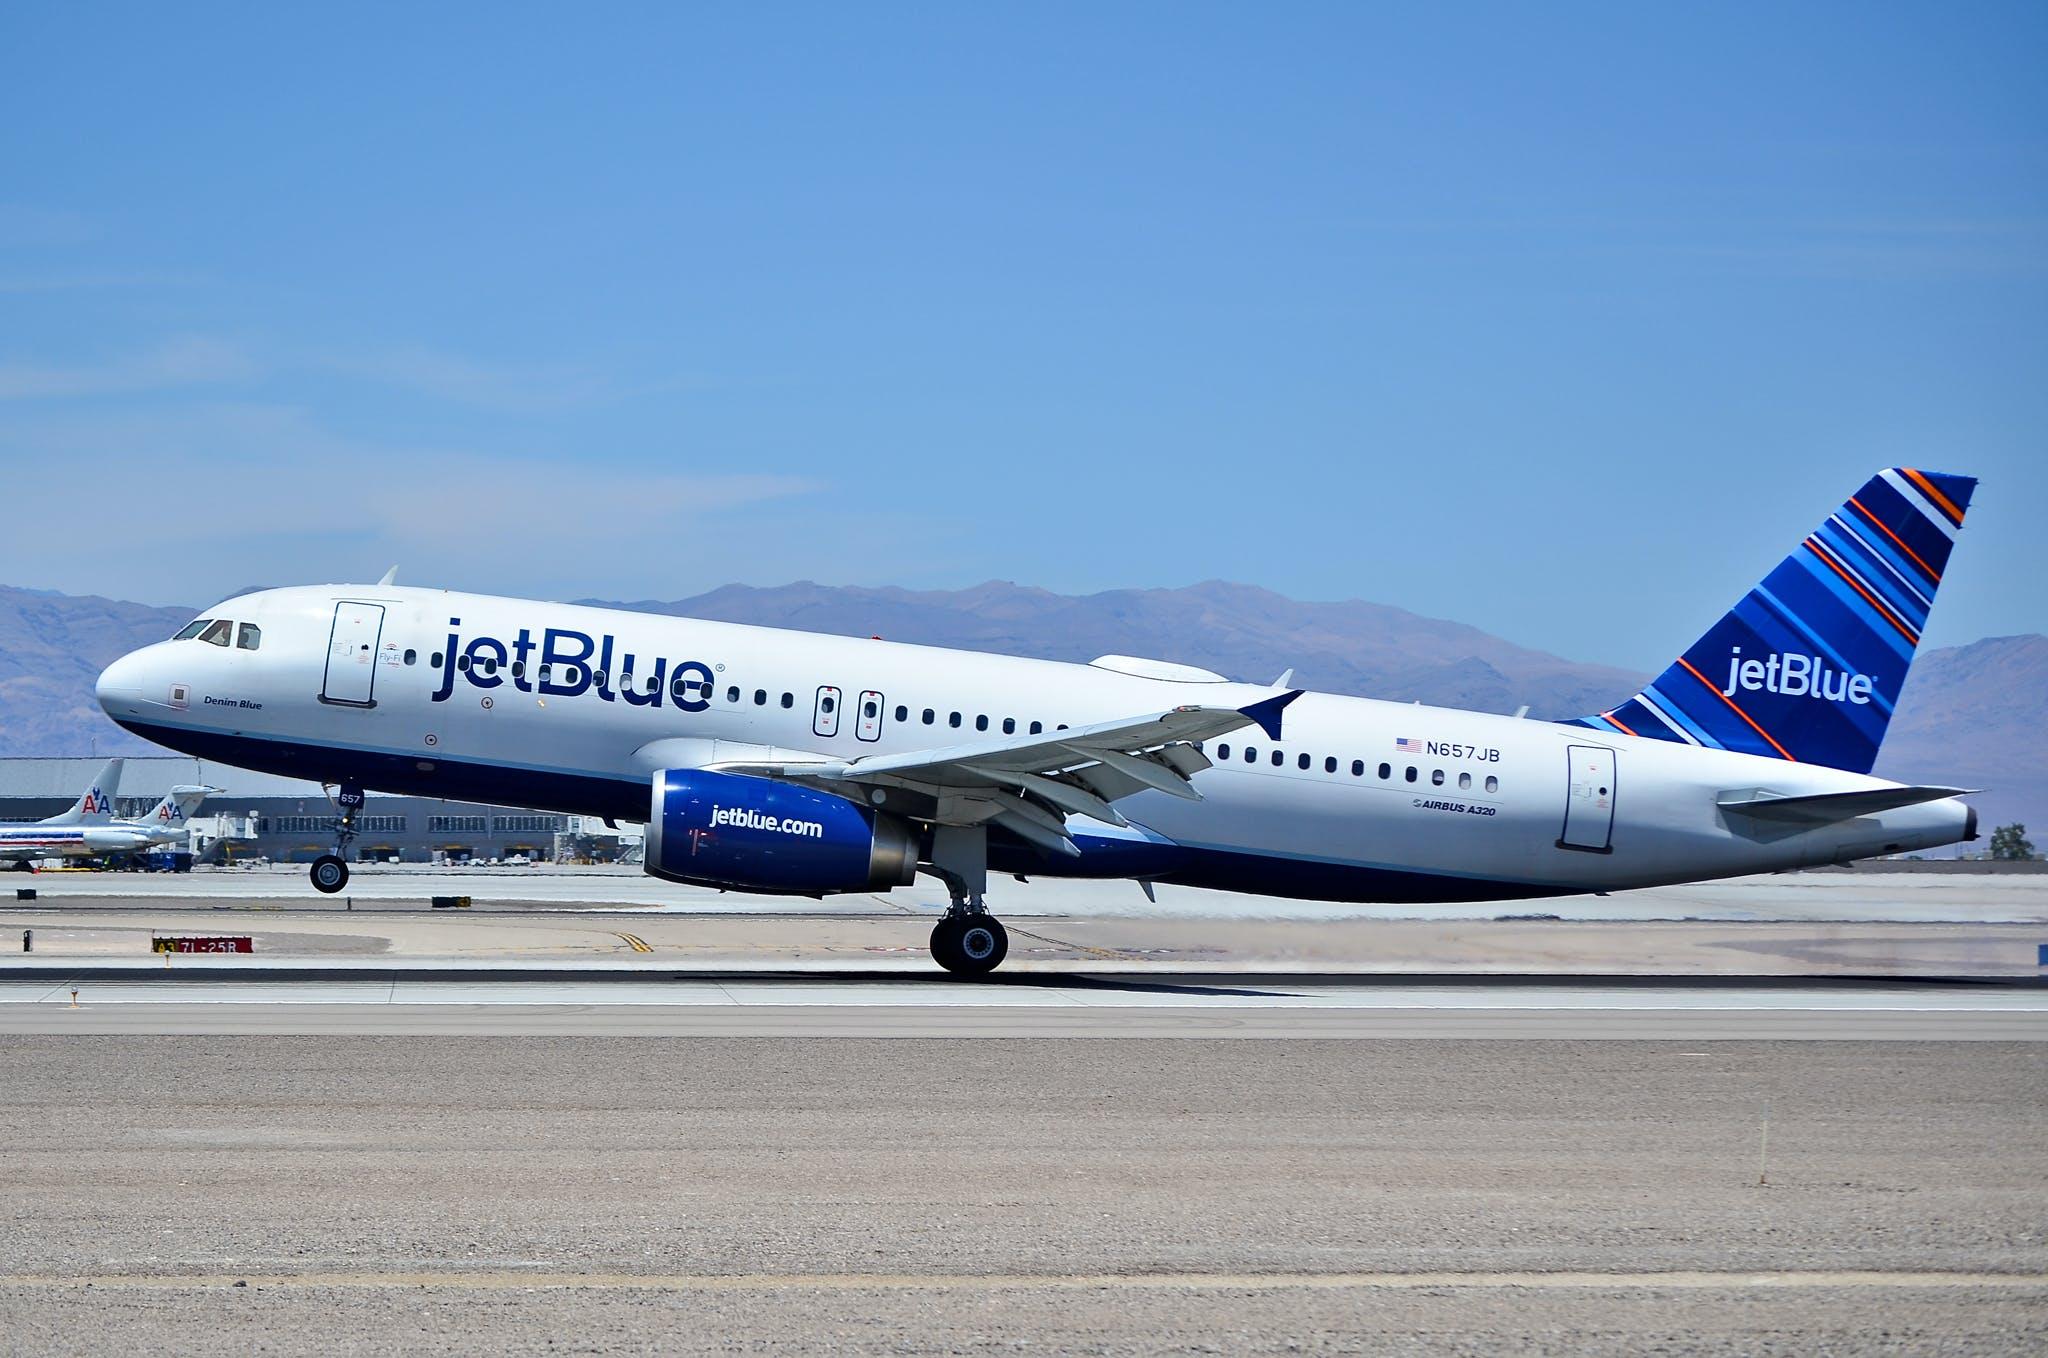 jetBlue airplane taking off